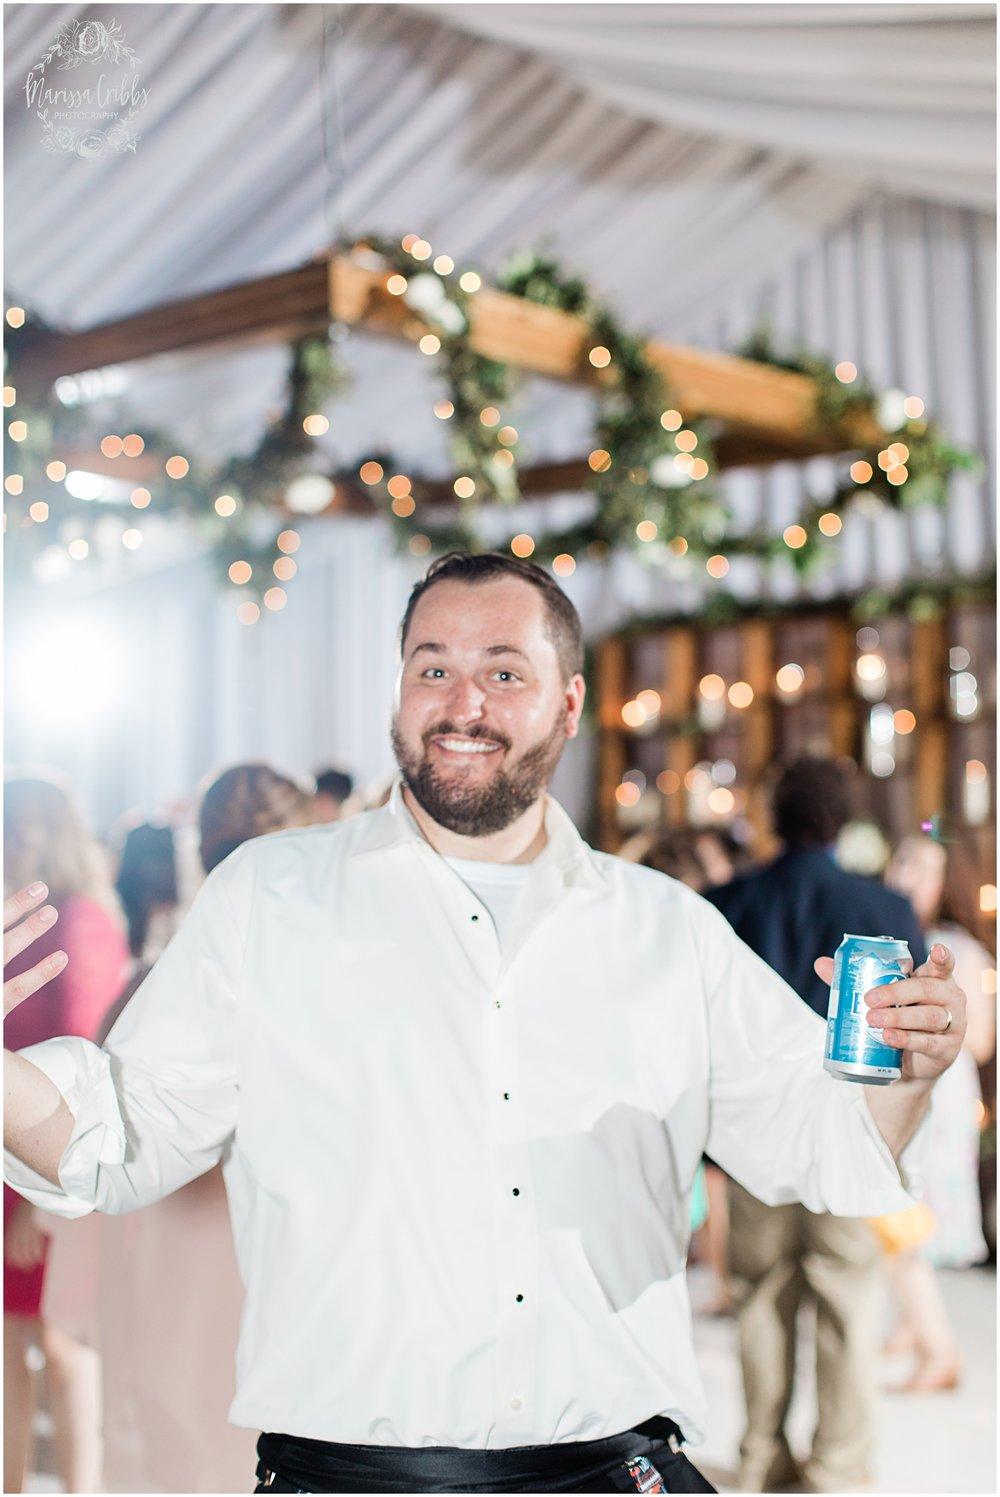 GORBY WEDDING | MARISSA CRIBBS PHOTOGRAPHY_5138.jpg